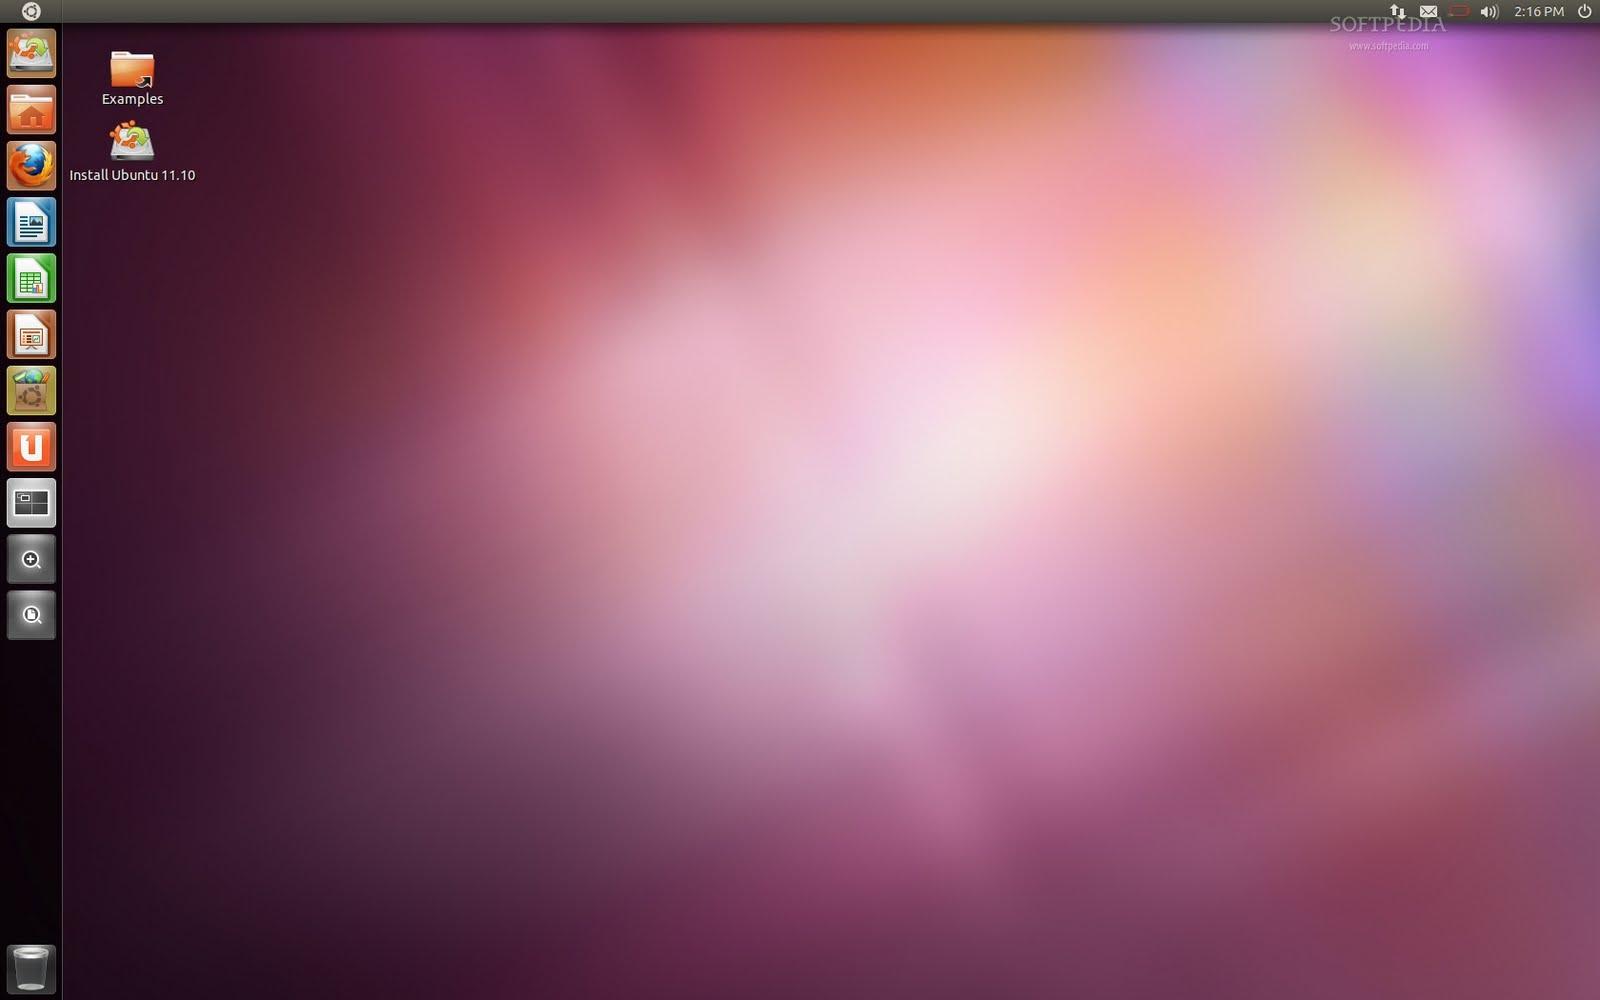 http://4.bp.blogspot.com/-89JKG5ScMCs/TjuaTiAY53I/AAAAAAAAEM8/u8-9OS4tnkY/s1600/Ubuntu-11-10-Alpha-3.jpg